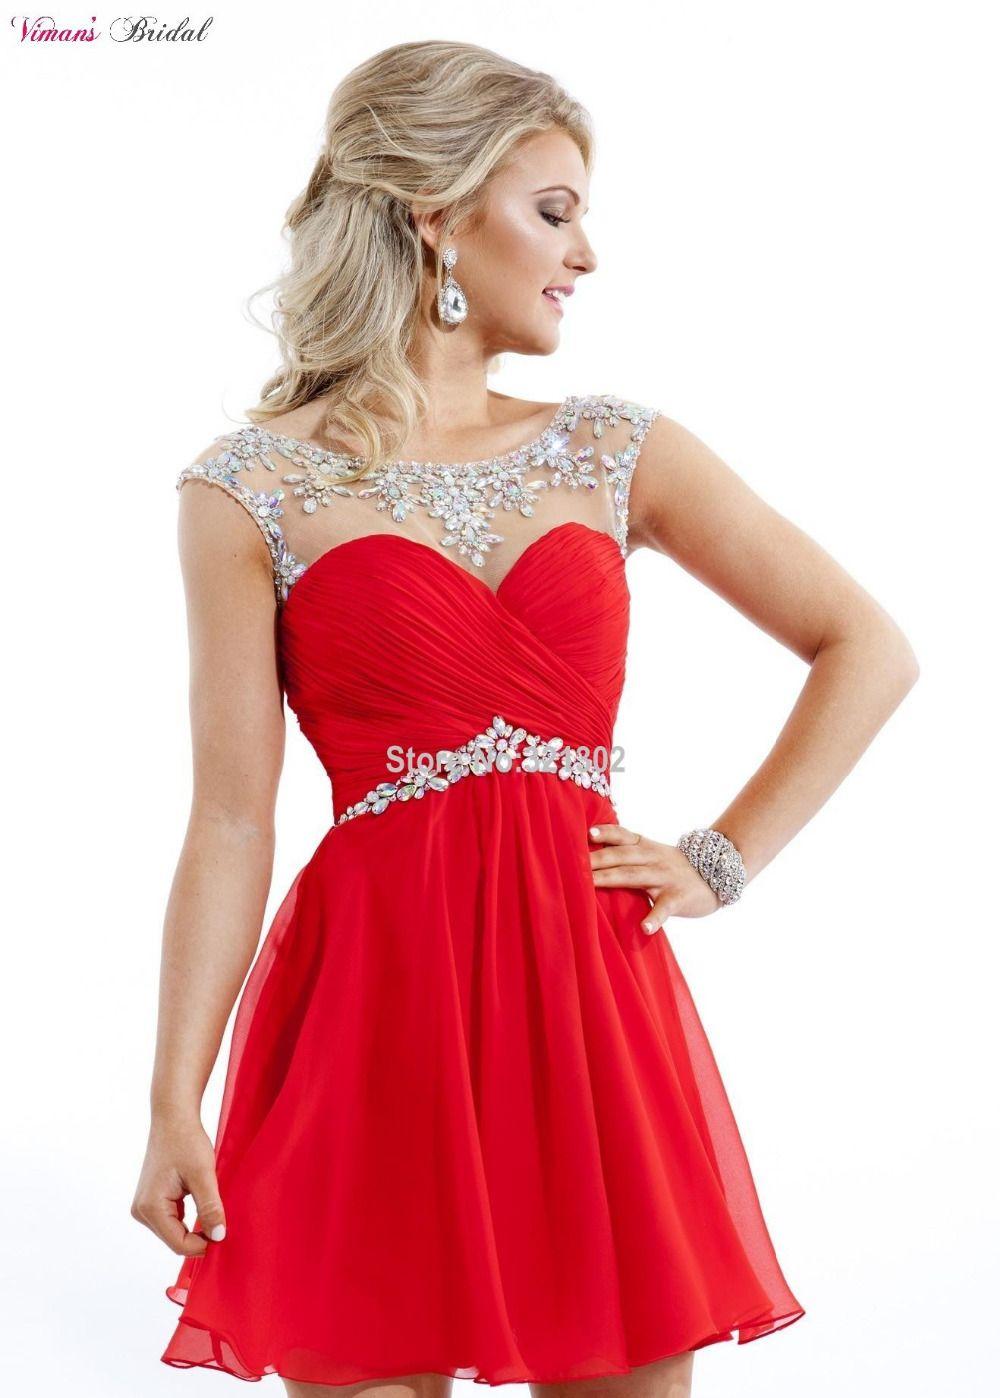 186c3de21a4106 Goedkope Vintage a lijn chiffon crystal boven knielengte cocktail jurk  mouwloze mini open back party gown china EN151